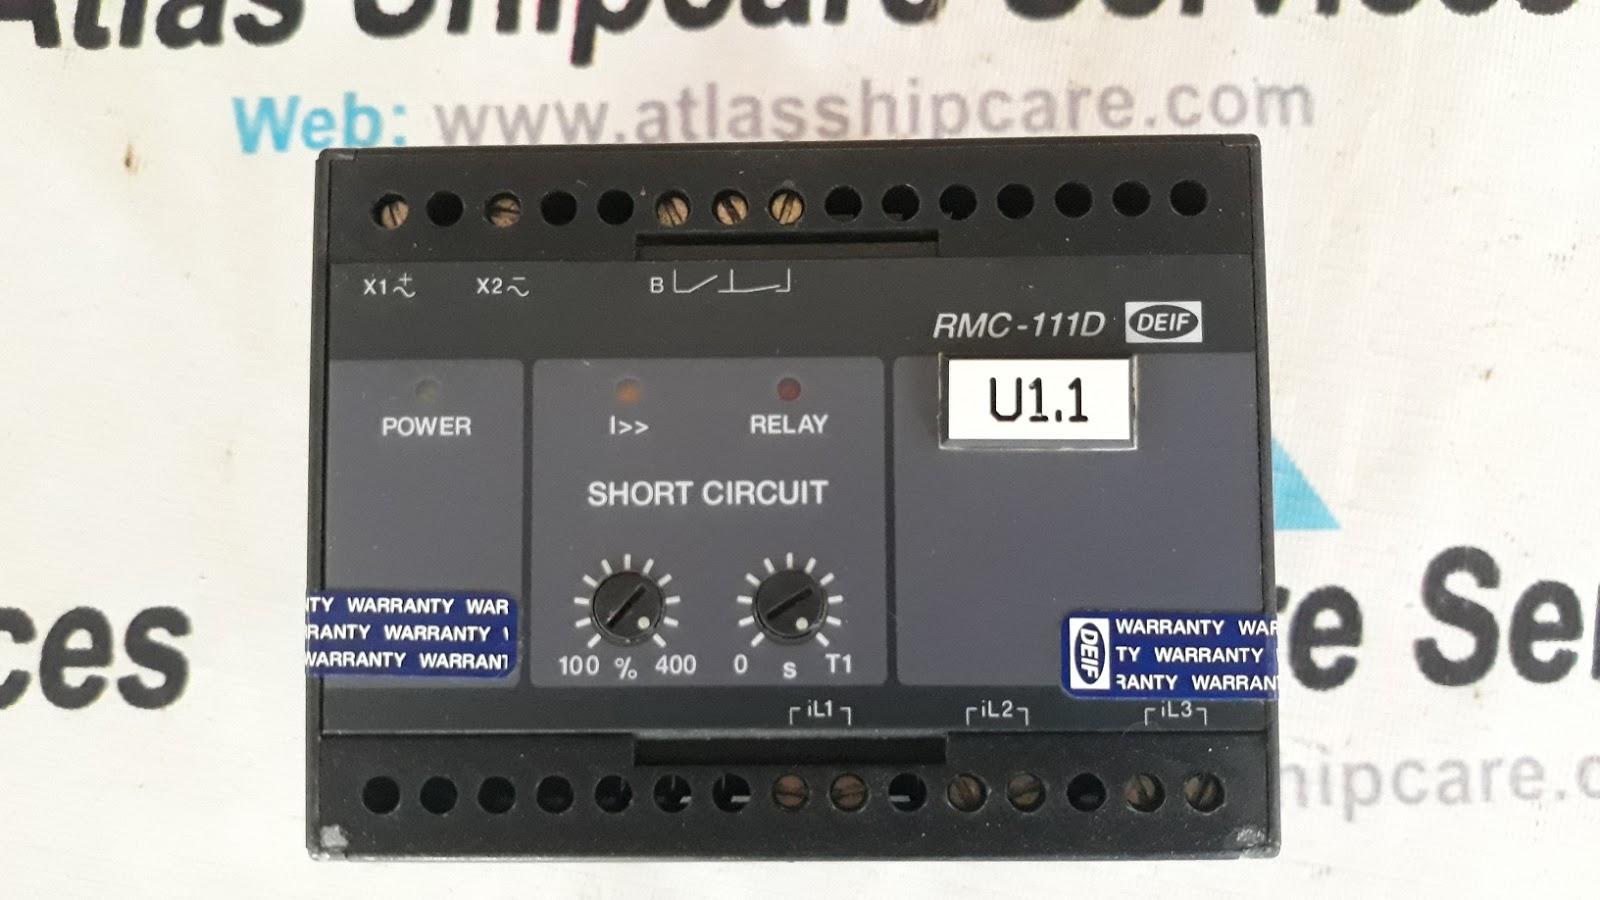 Deif Generator Control Rmc111d Short Circuit Relay Atlas Shipcare